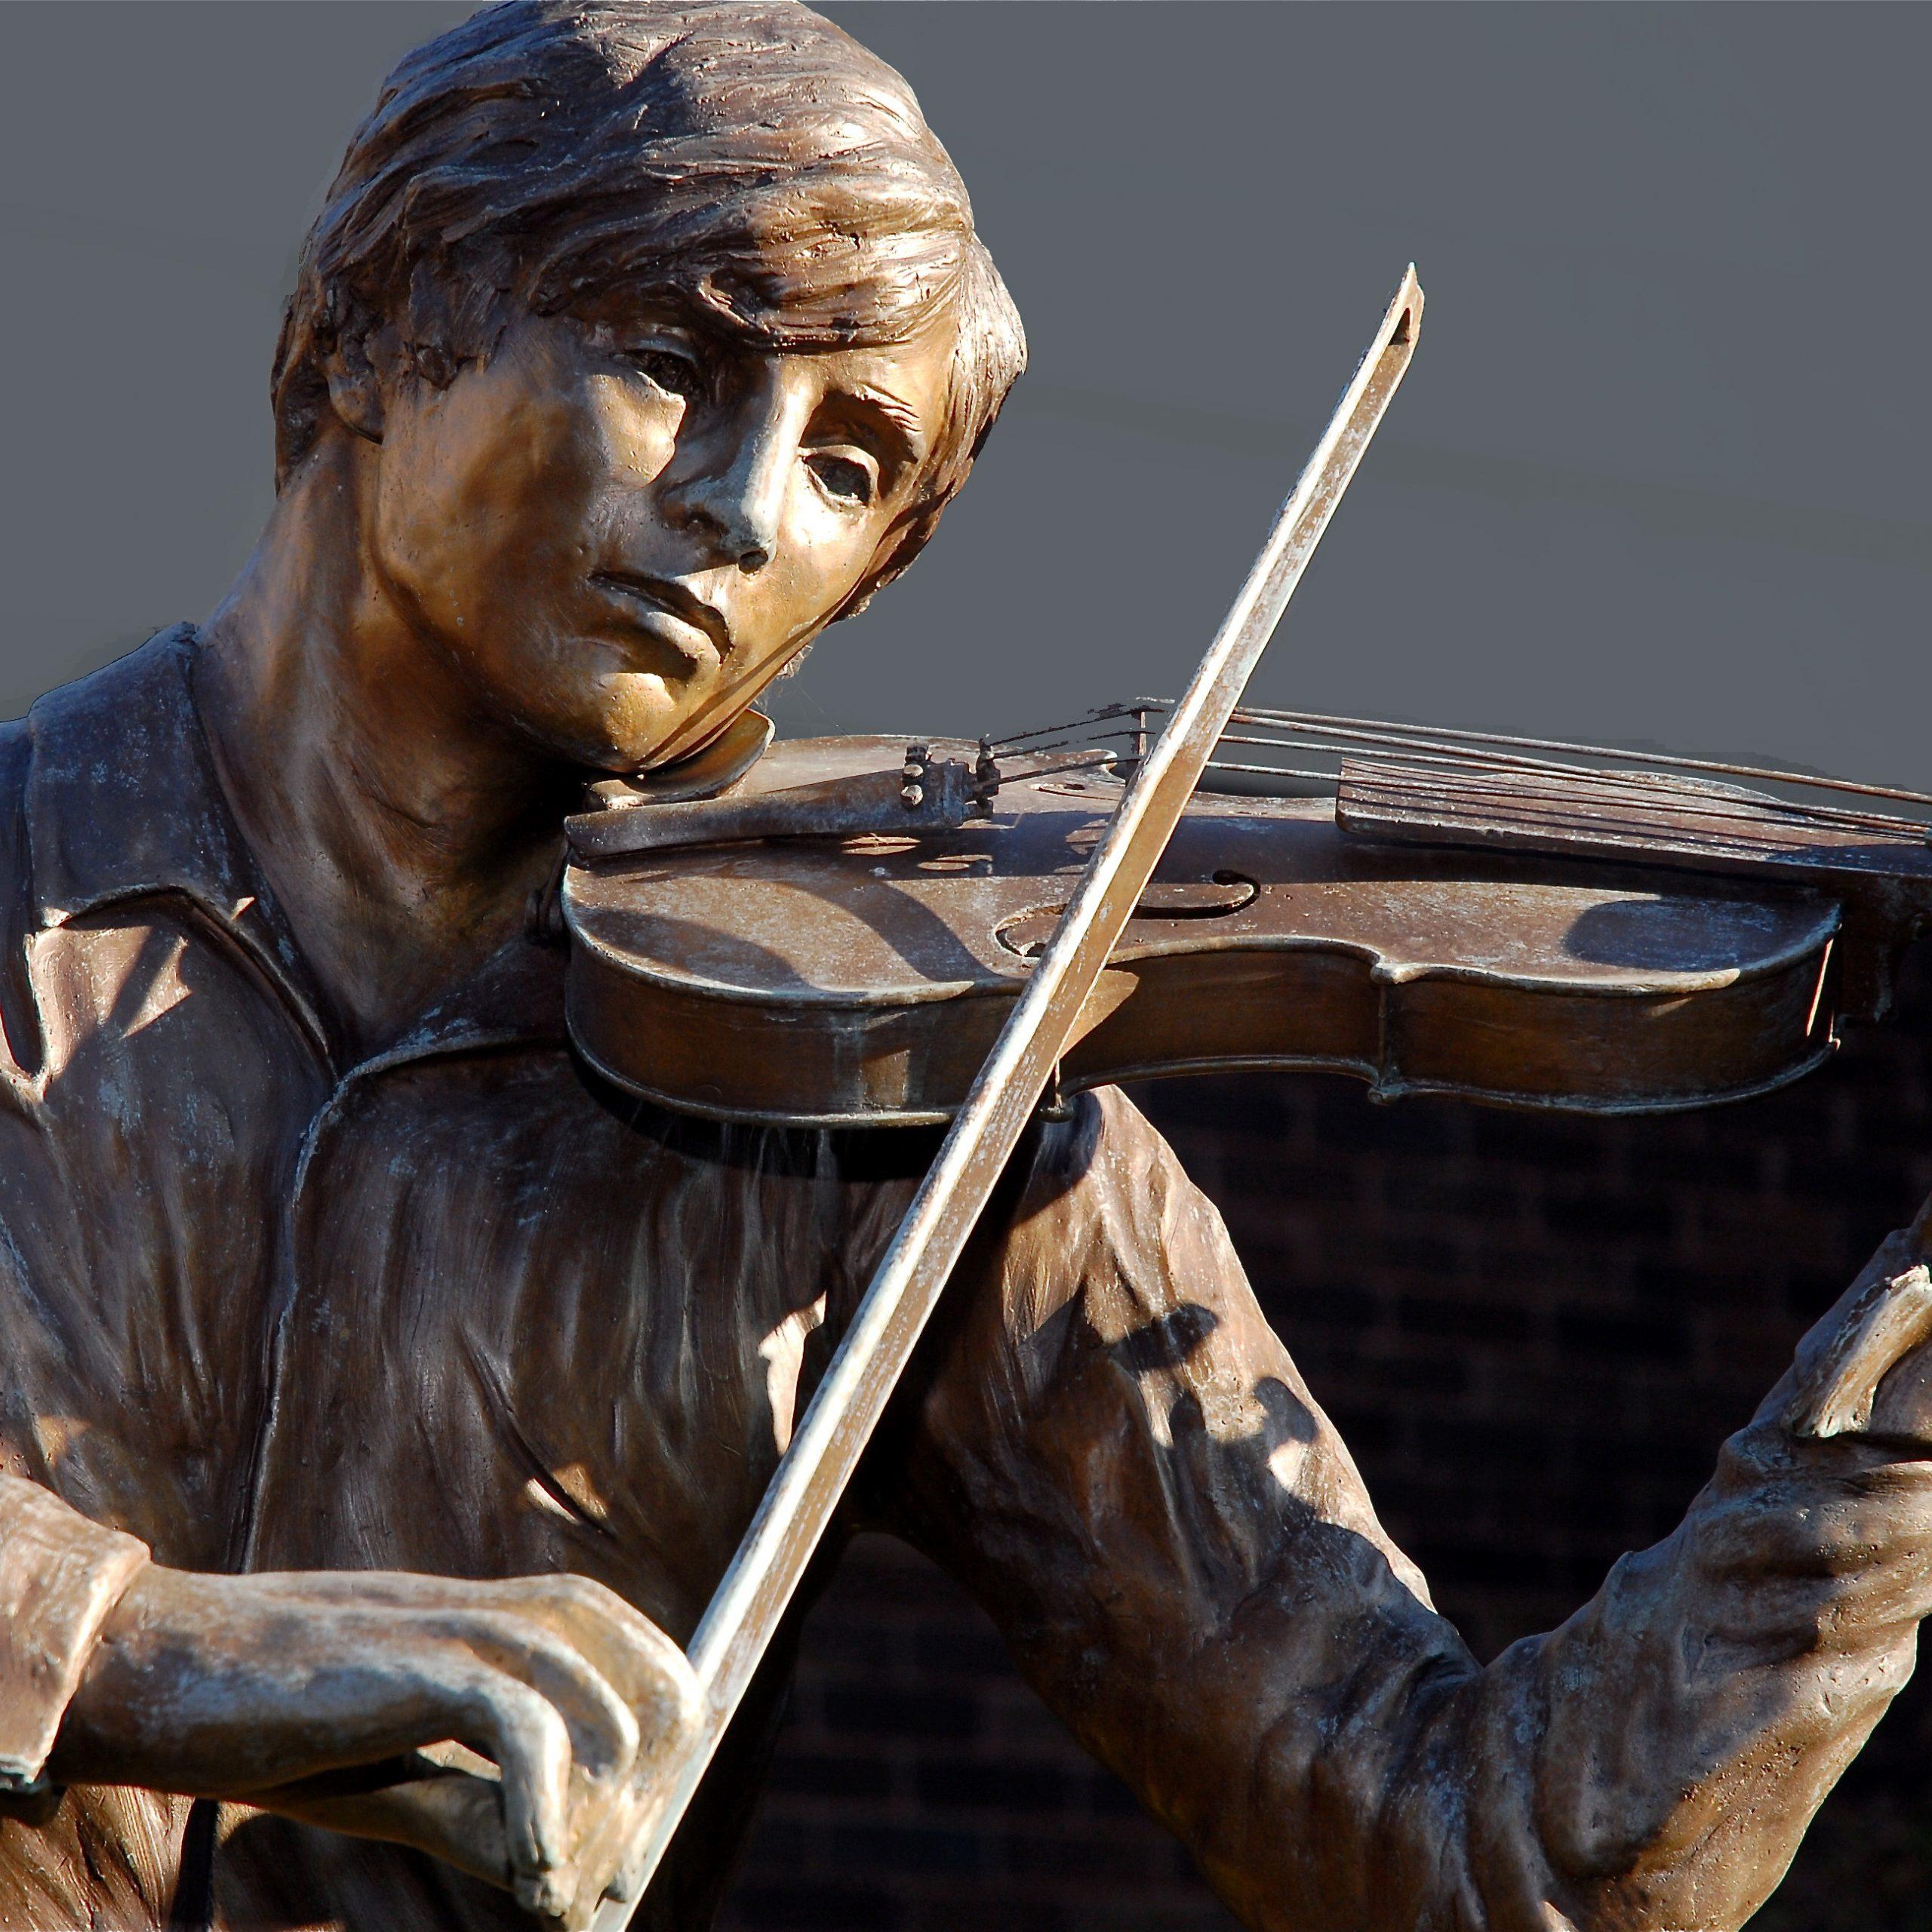 The Violinist-Bert Smith Memorial Garden-Flint Institute of Music